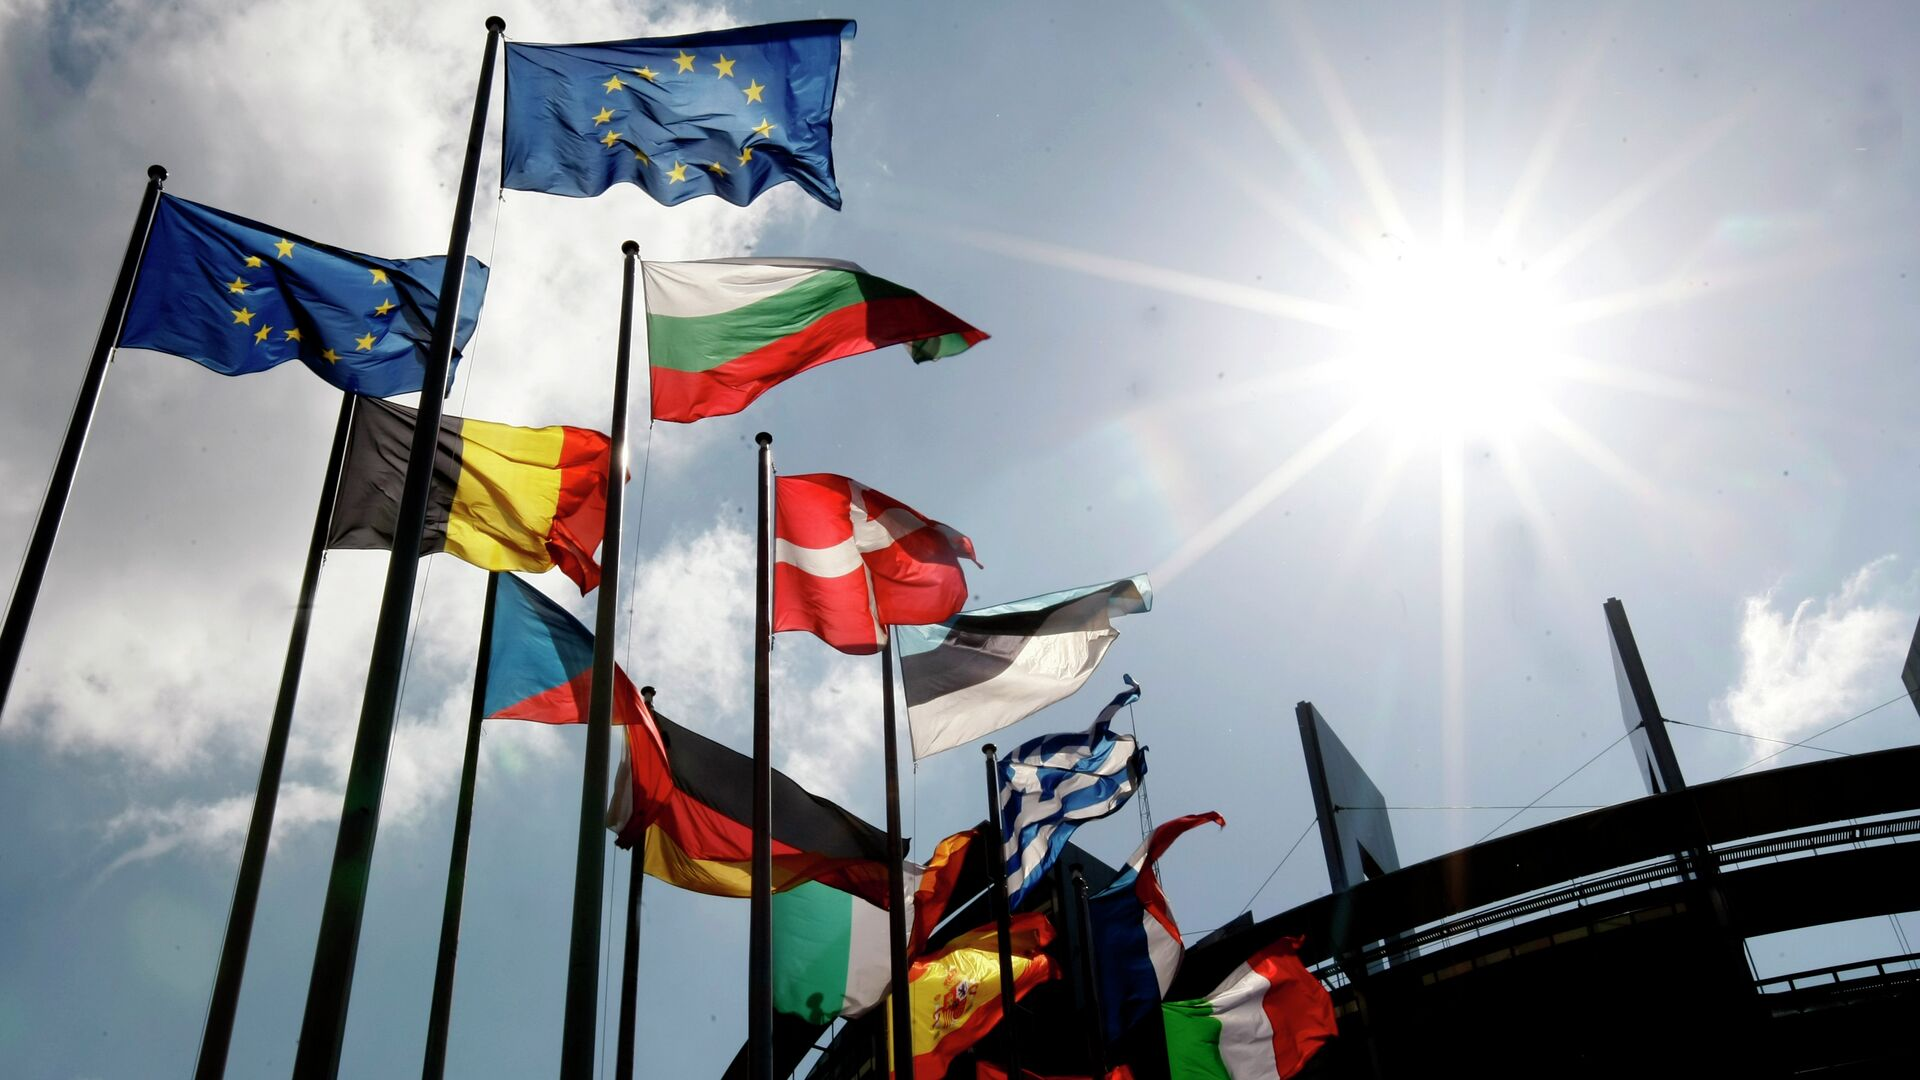 Flags are seen at the European Parliament  - Sputnik Mundo, 1920, 14.09.2021